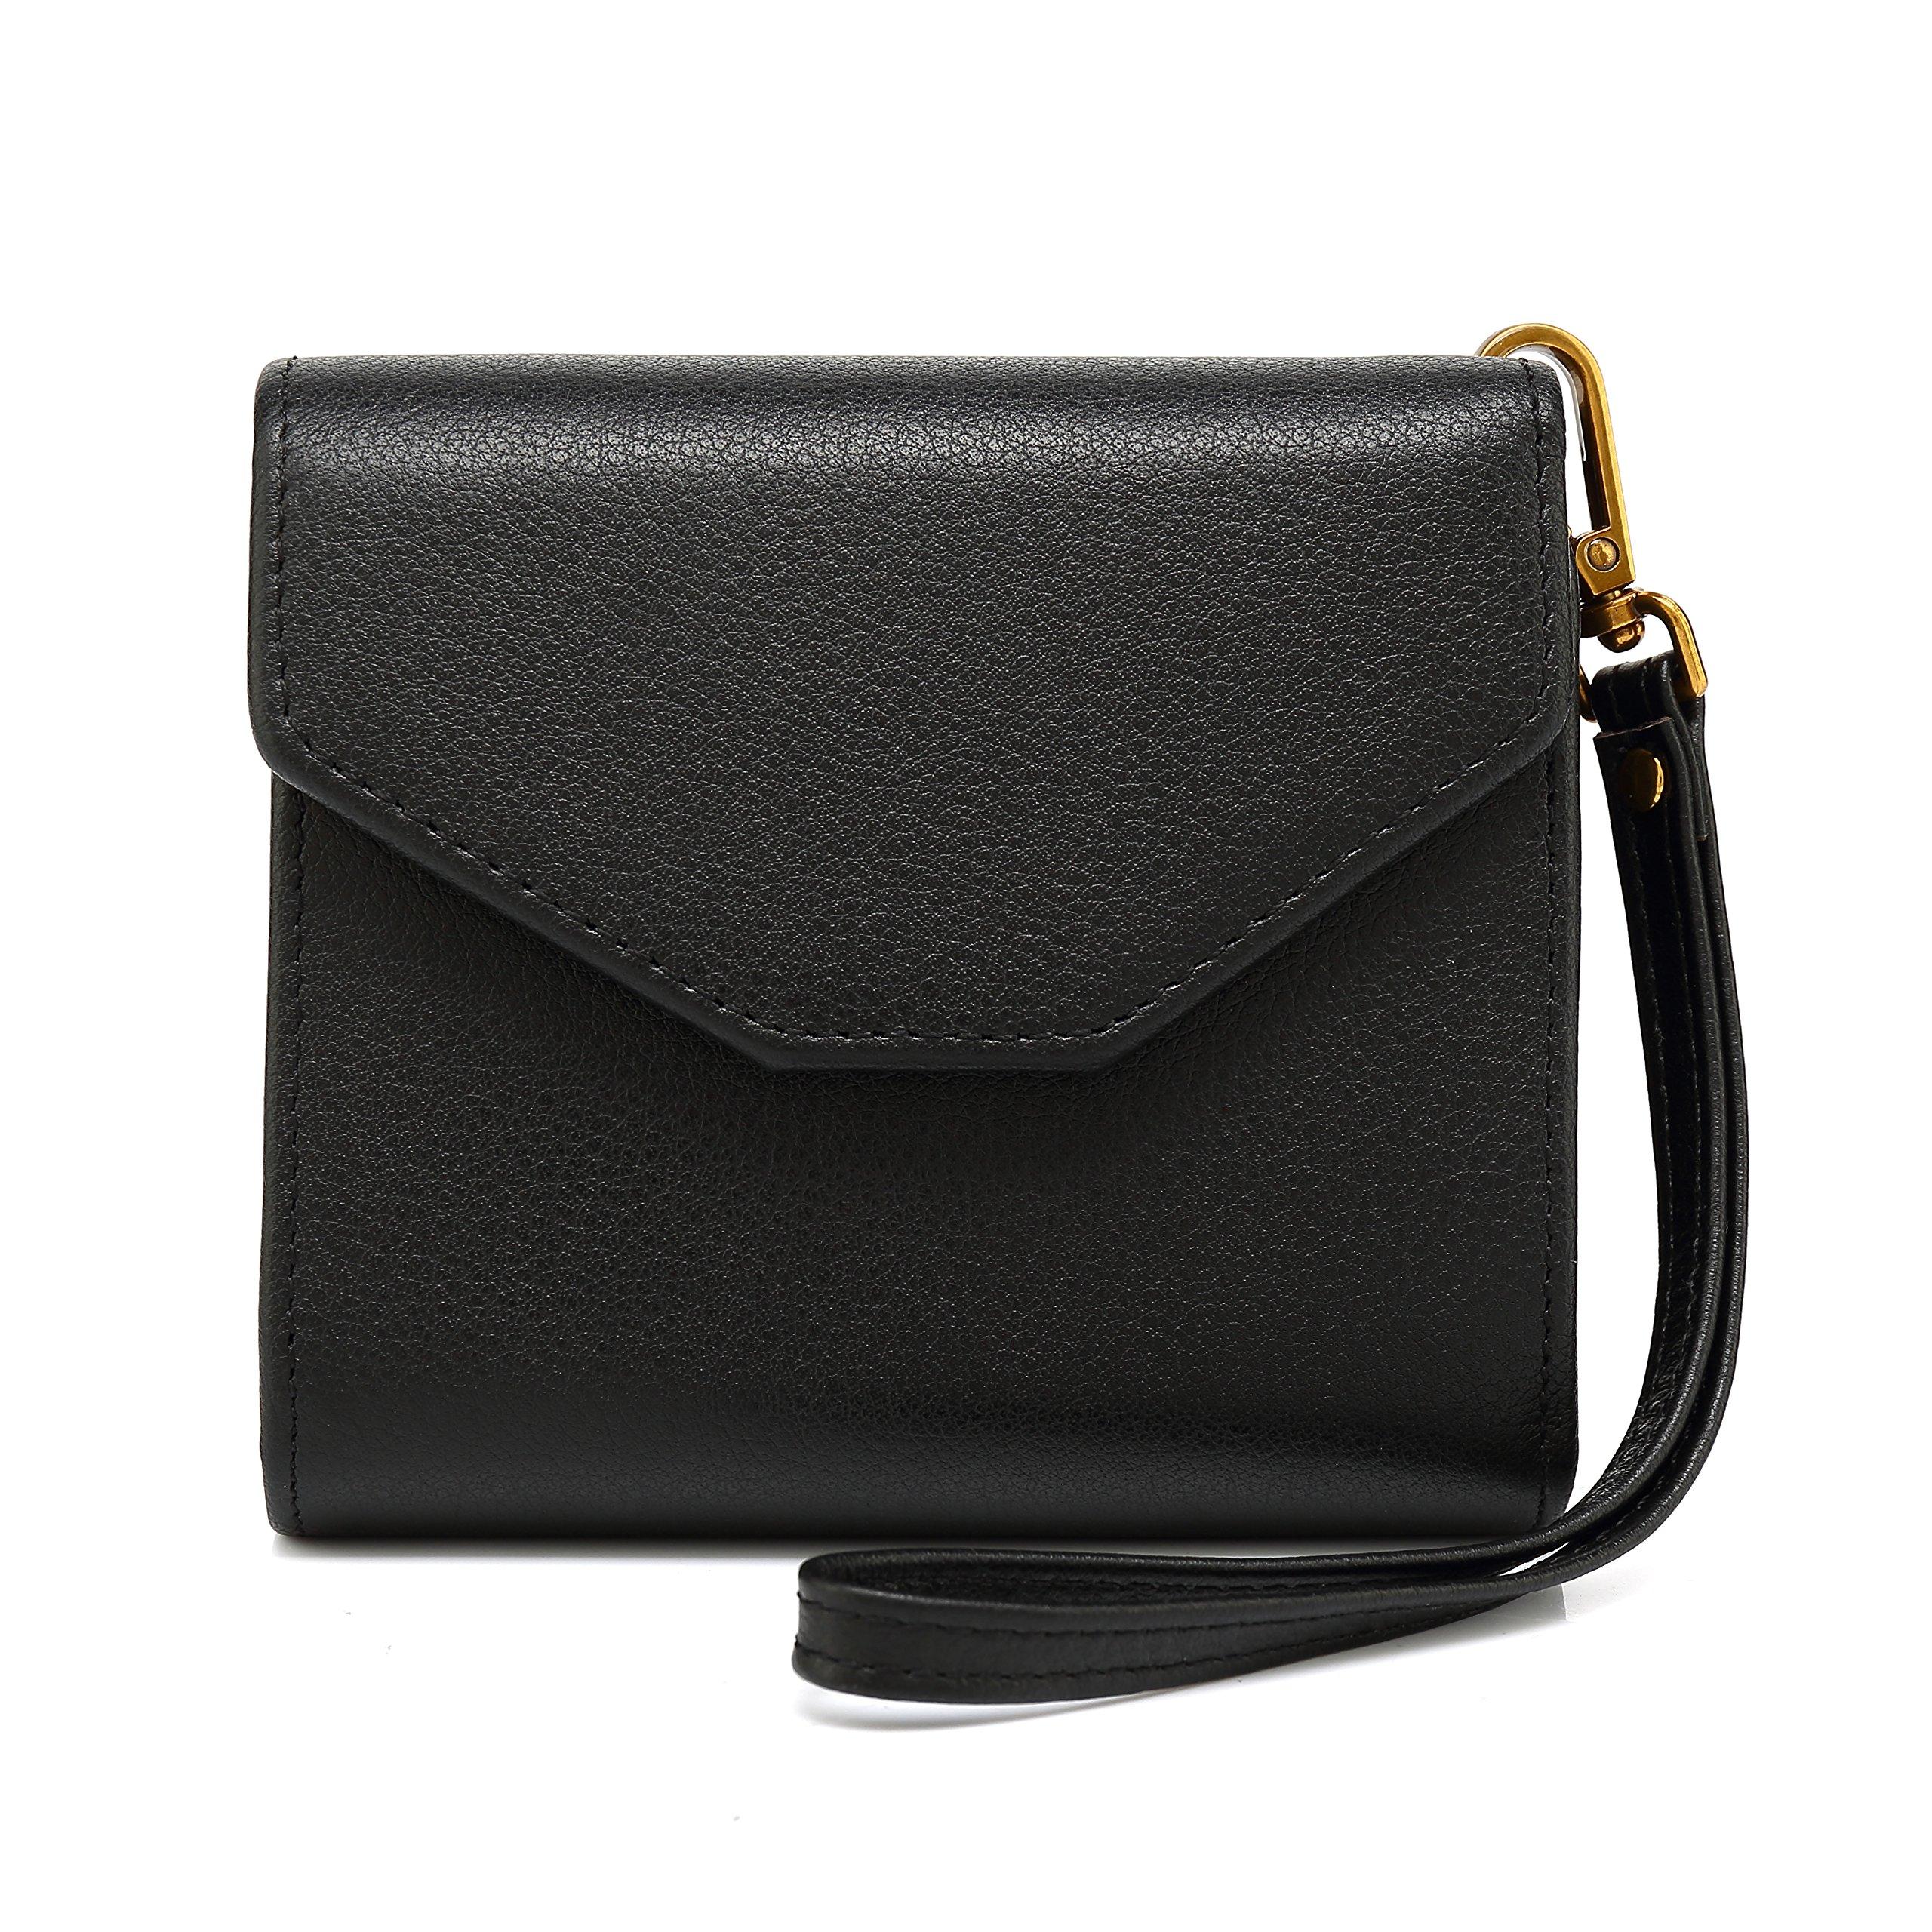 Pomoda RFID Blocking Wallet, Envelope Style Leather Wallet Fashion Pocket (Black)